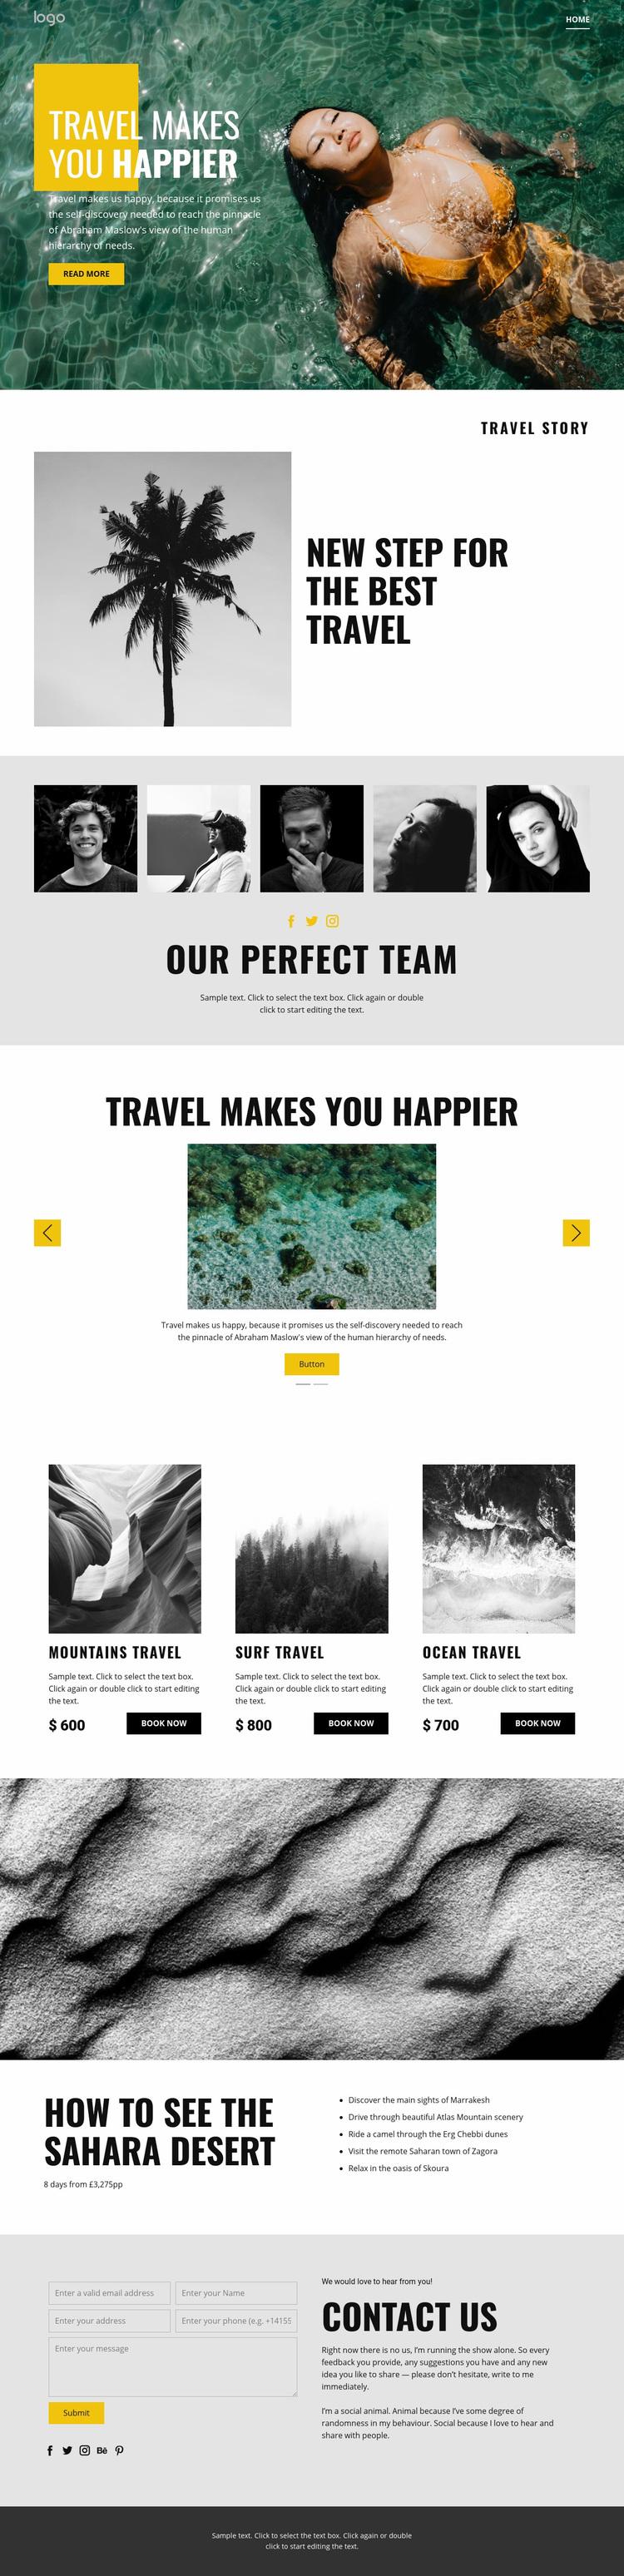 Happy people deserve travel Web Page Designer